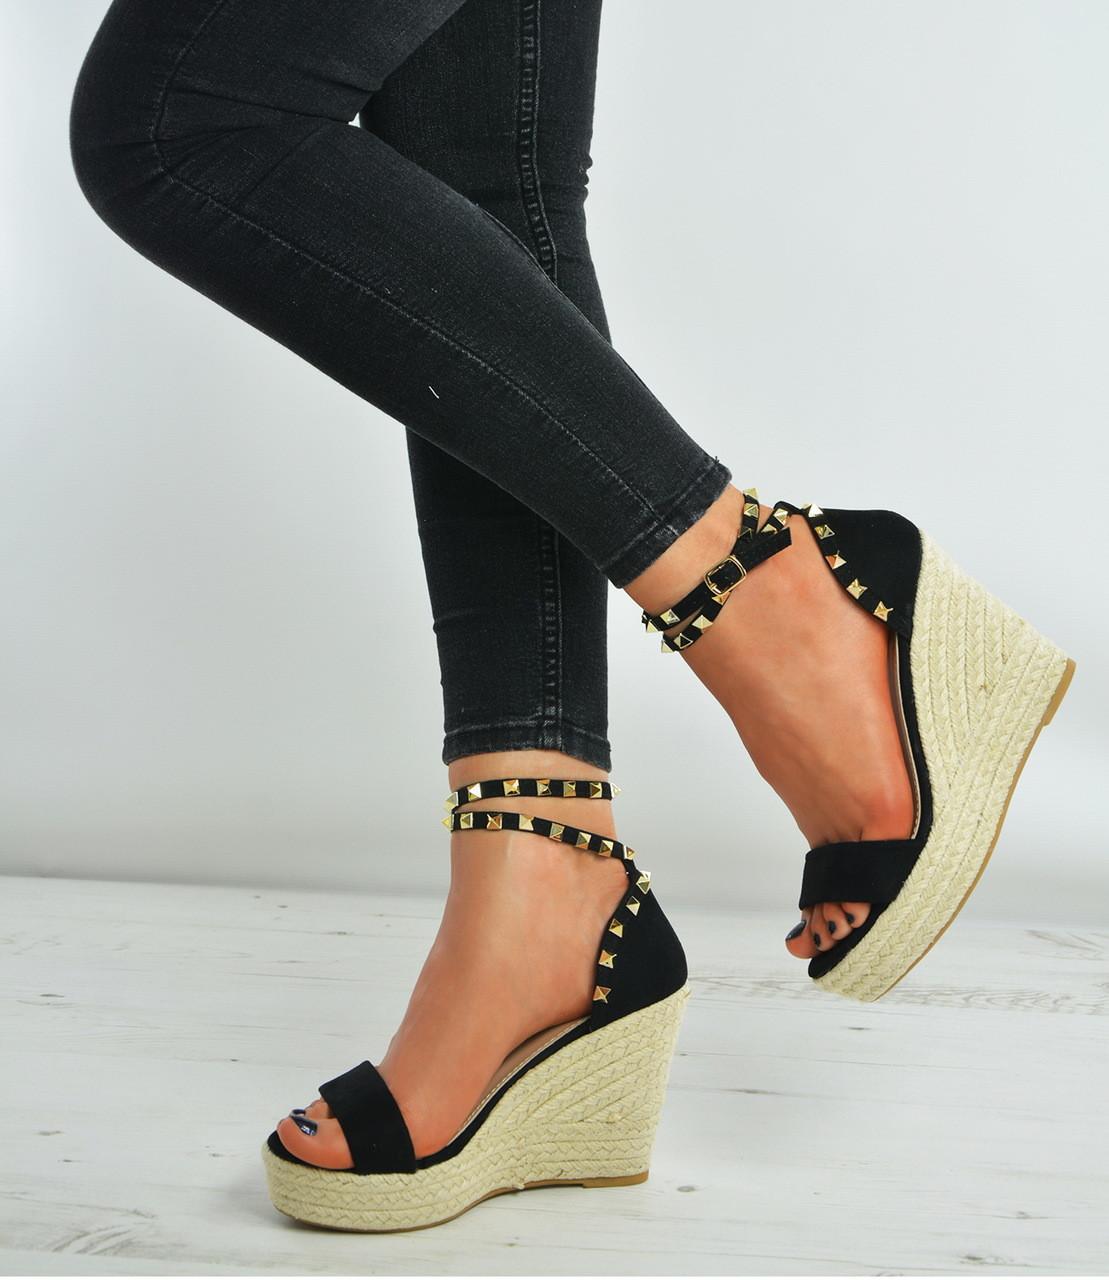 b7a76e19b2e Black Suede Rock Studs Espadrille High Wedge Heels Platform Sandals ...